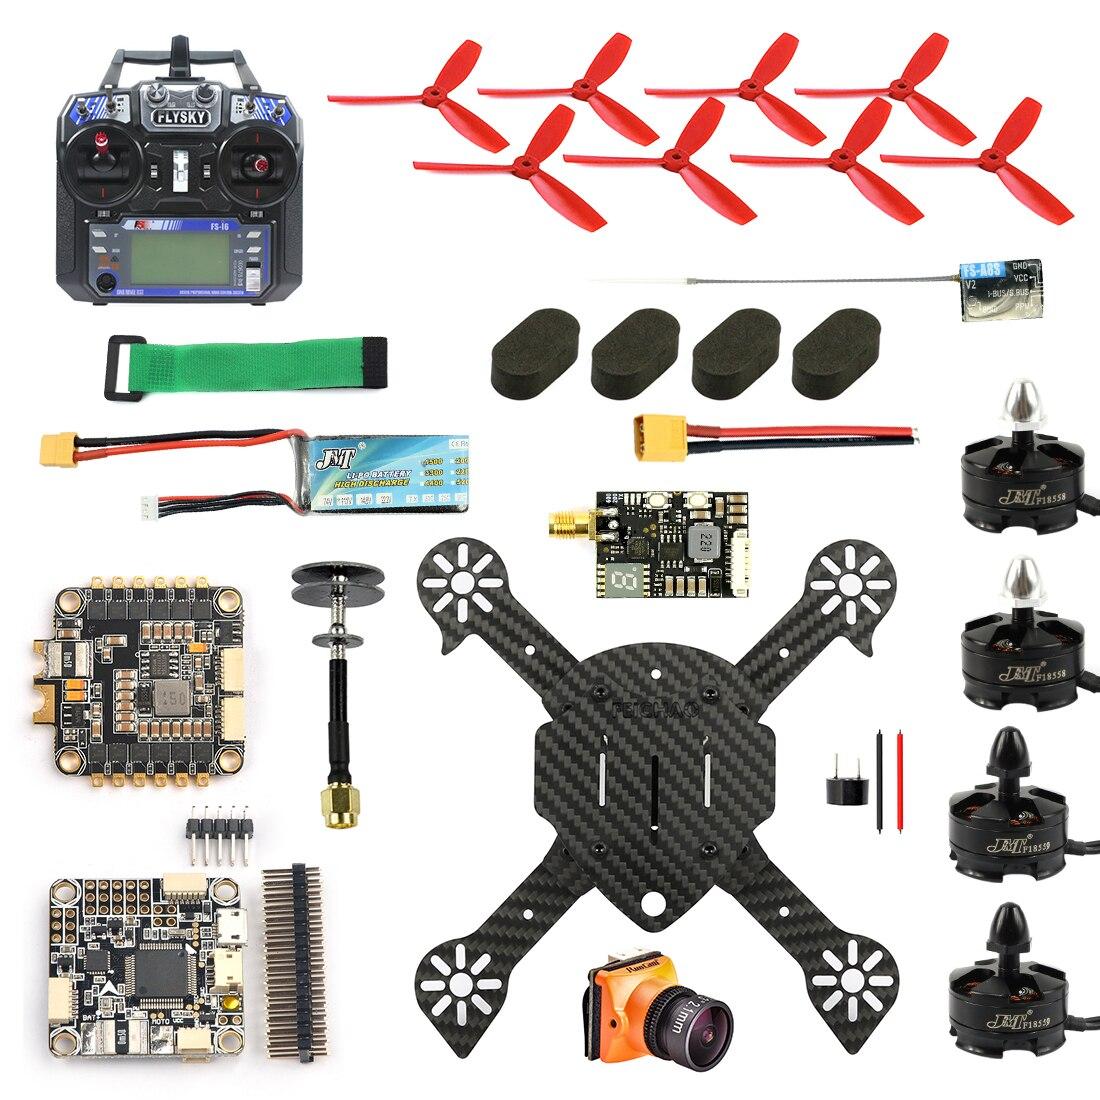 JMT DIY FPV Racer Drone Quadcopter RTF F4 Pro V2 Flight Cont